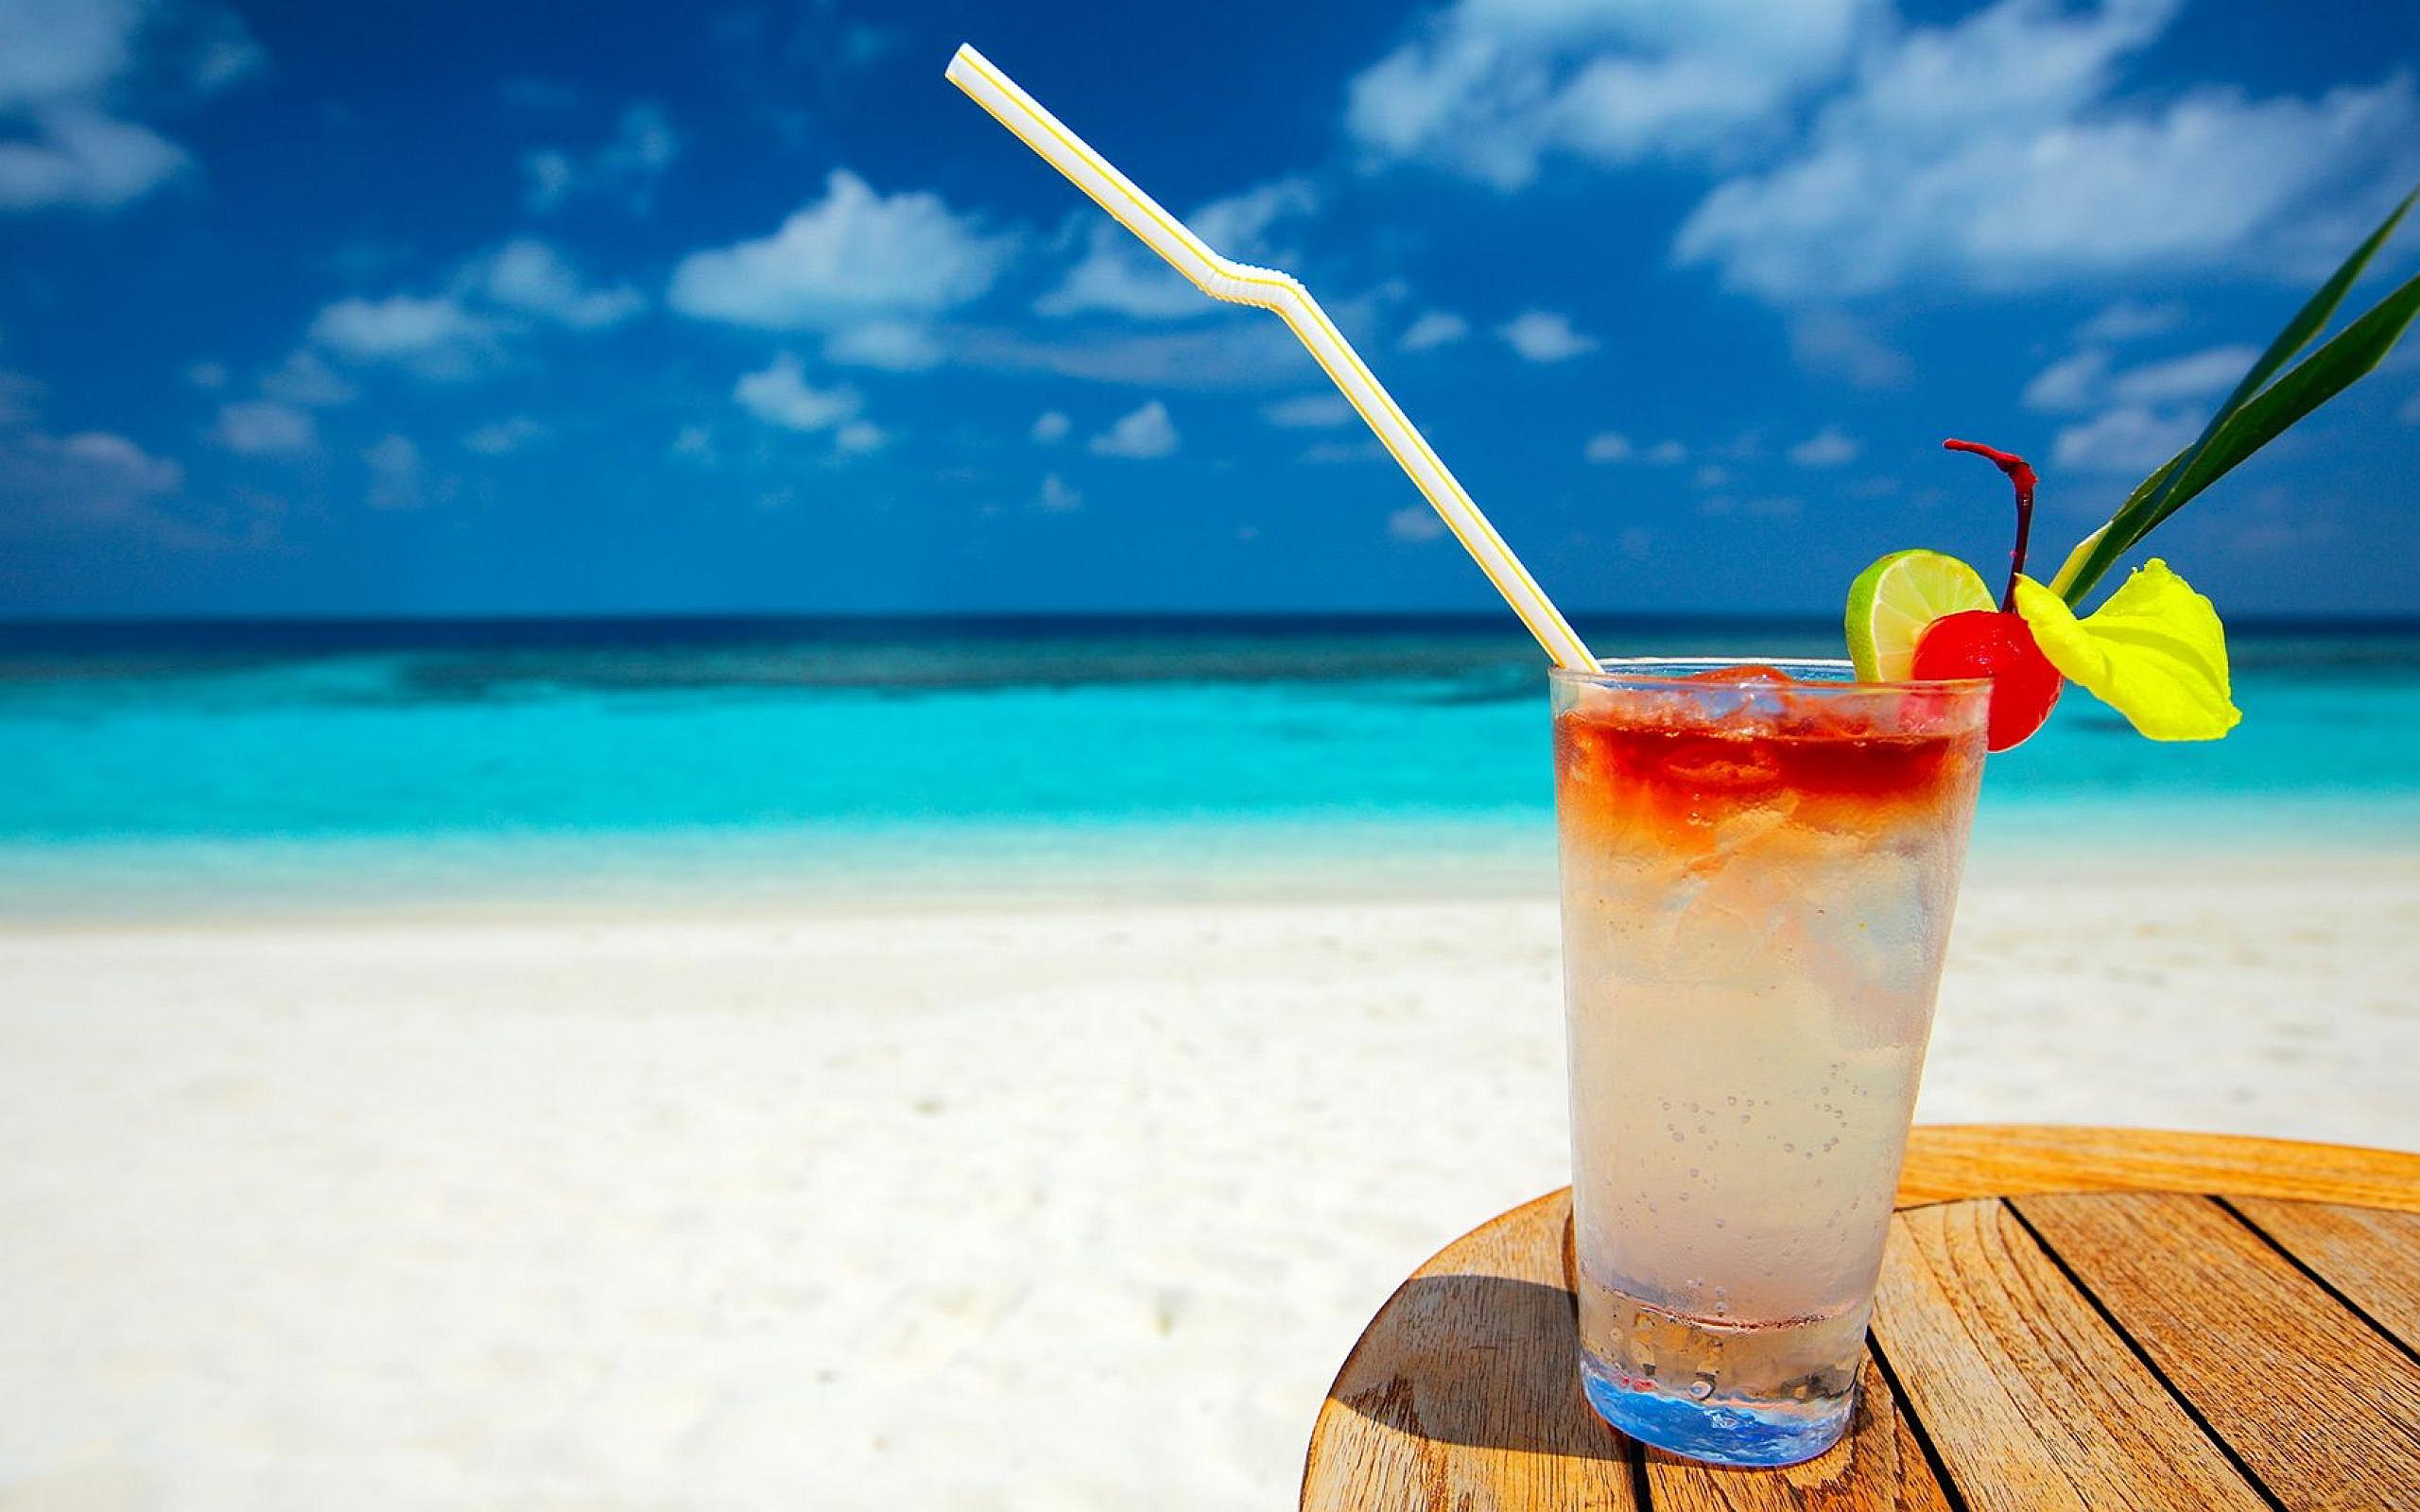 beach scenes wallpaper With Resolutions 2560×1600 Pixel